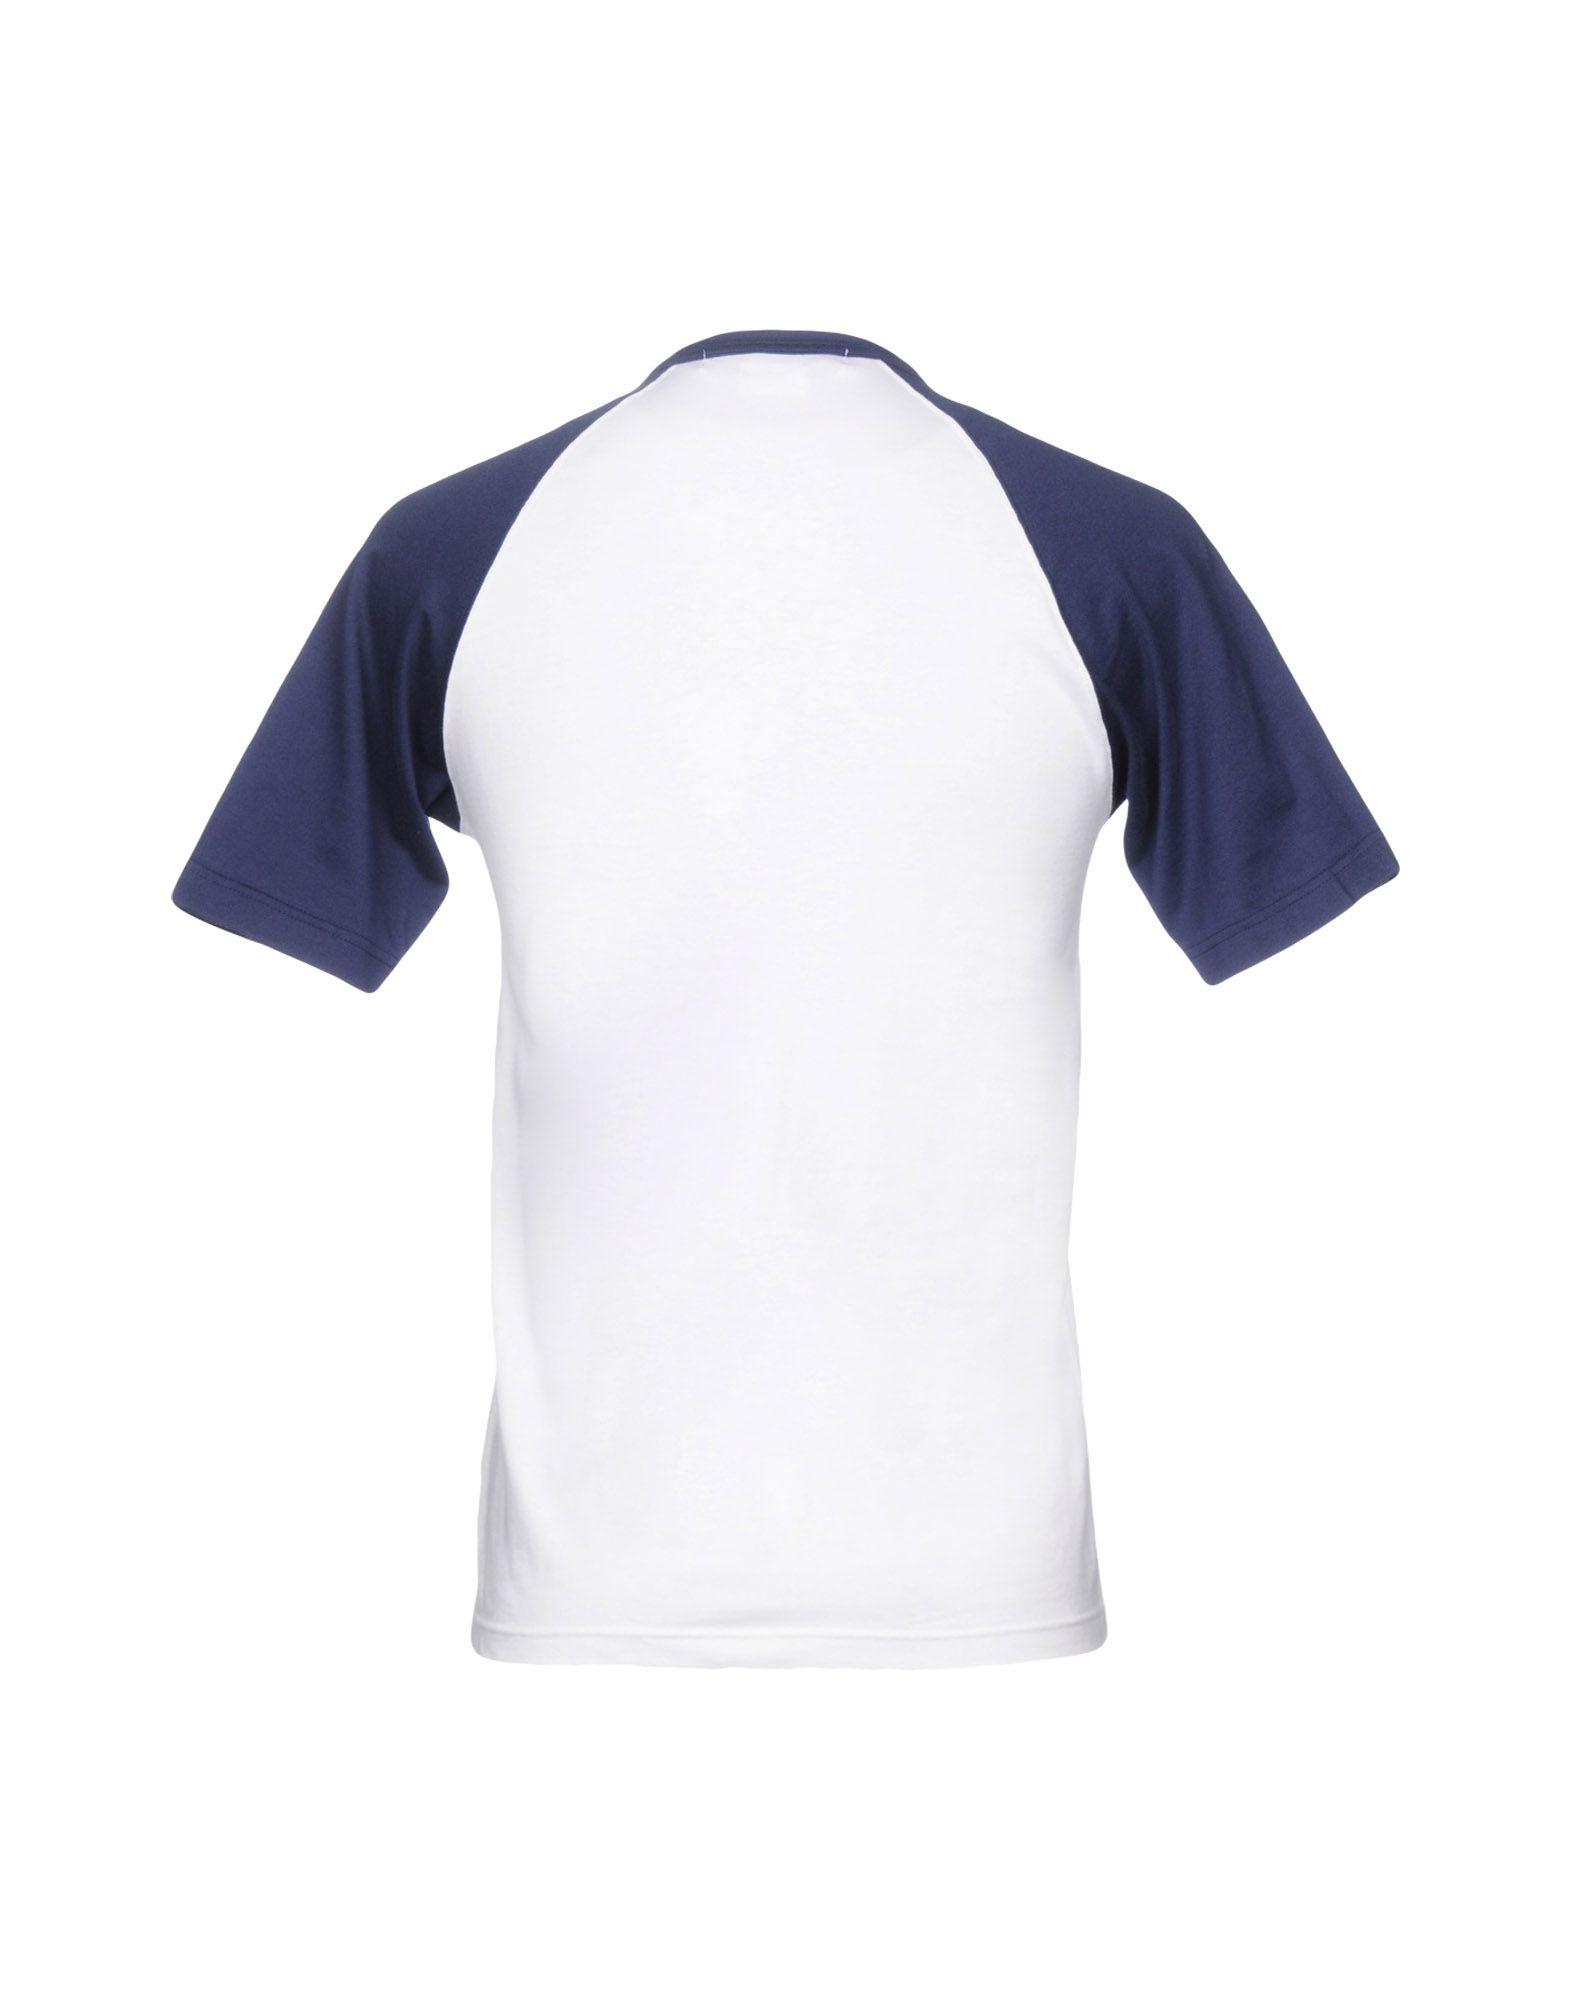 T-Shirt Junya Watanabe - Comme Des Gar ons Man Uomo - Watanabe 12164586GM aba958